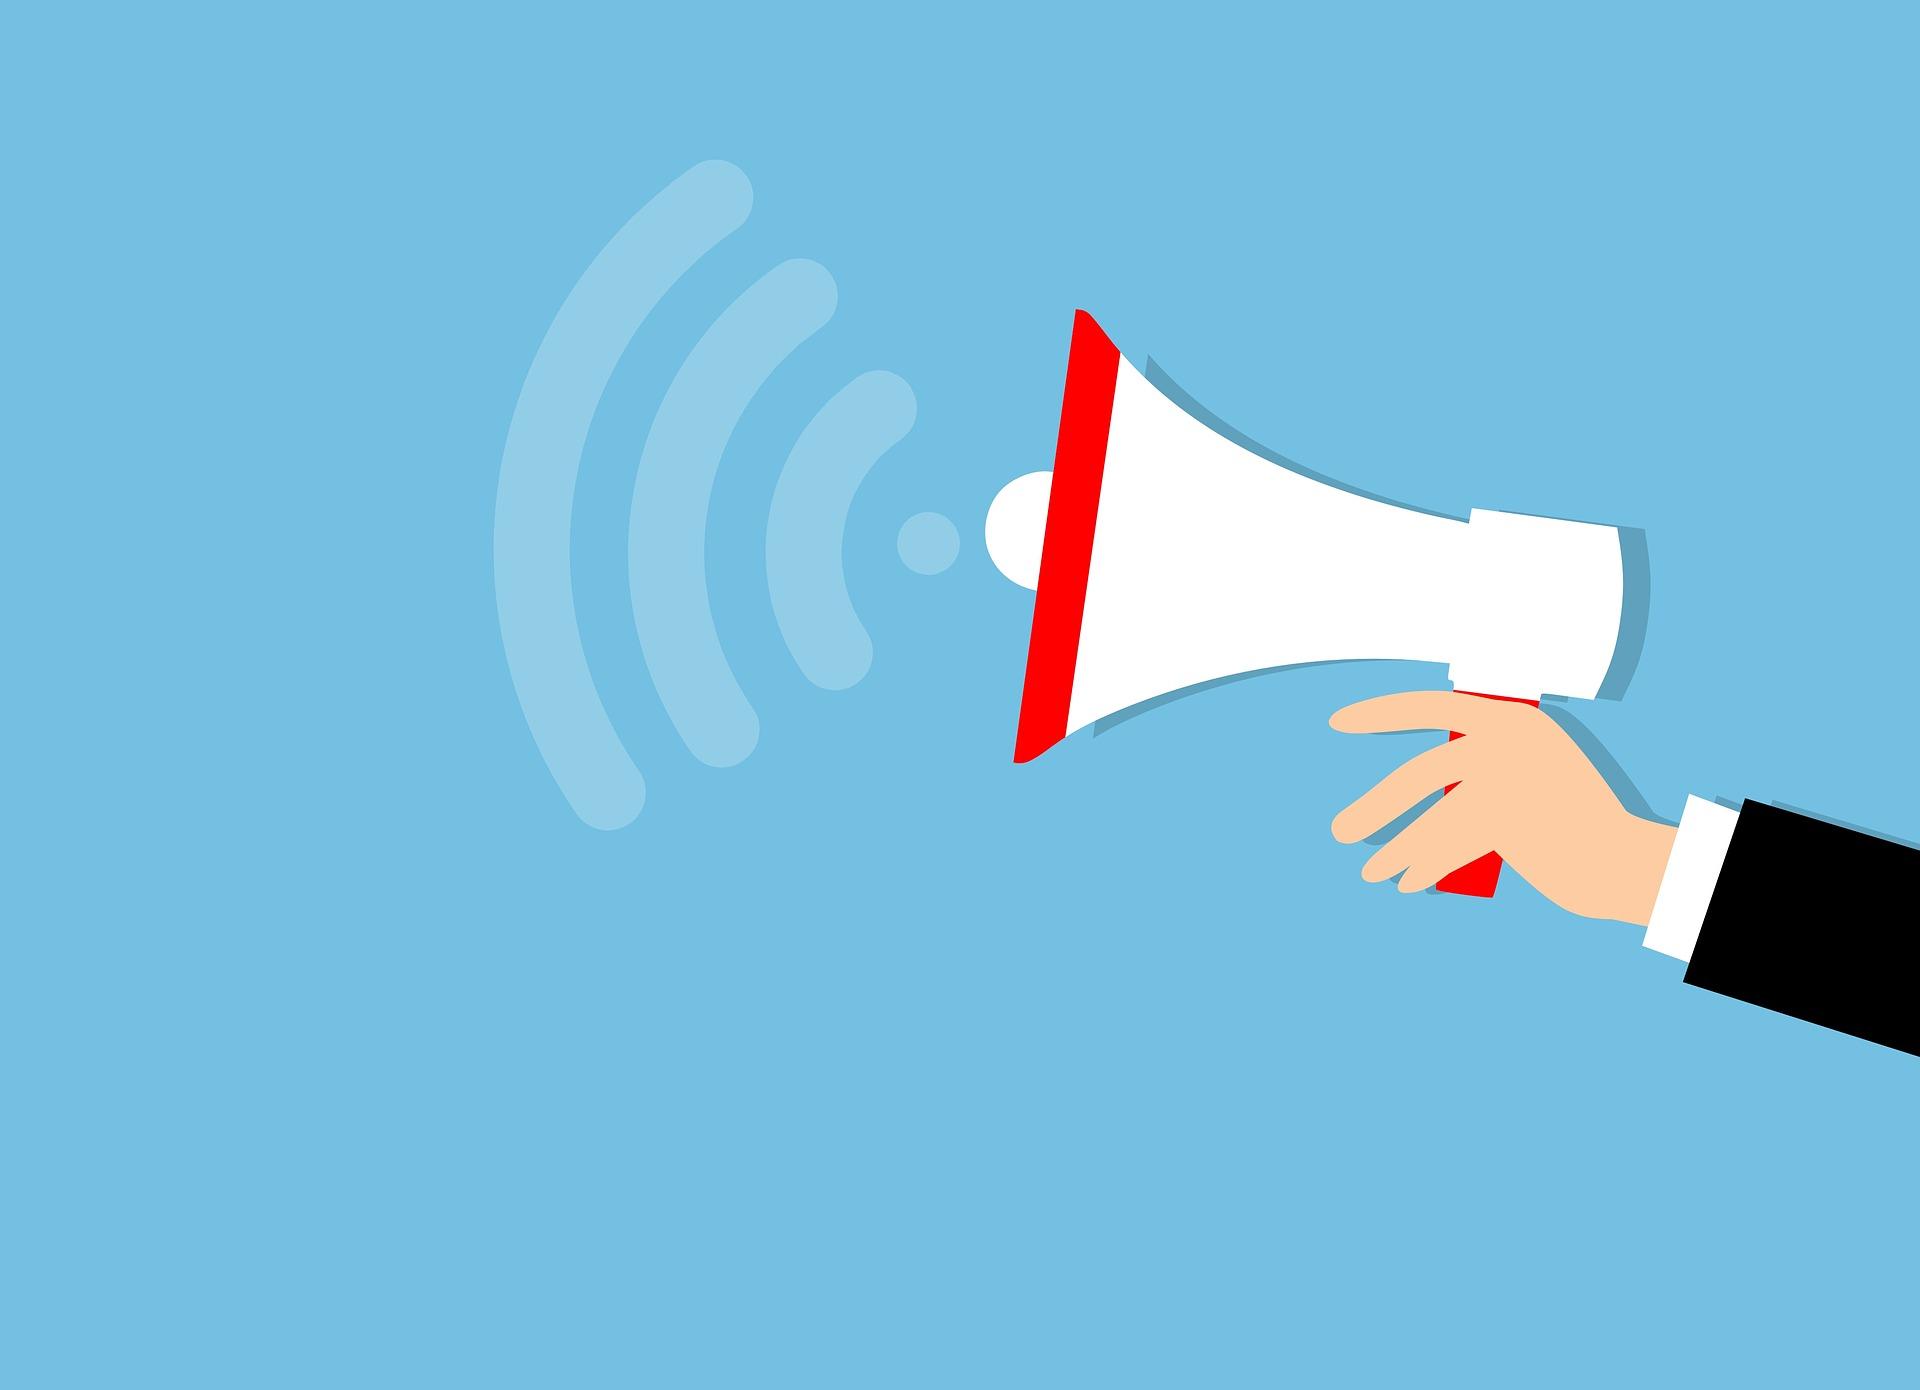 uwaga alarm WiFi Wi-Fi megafon